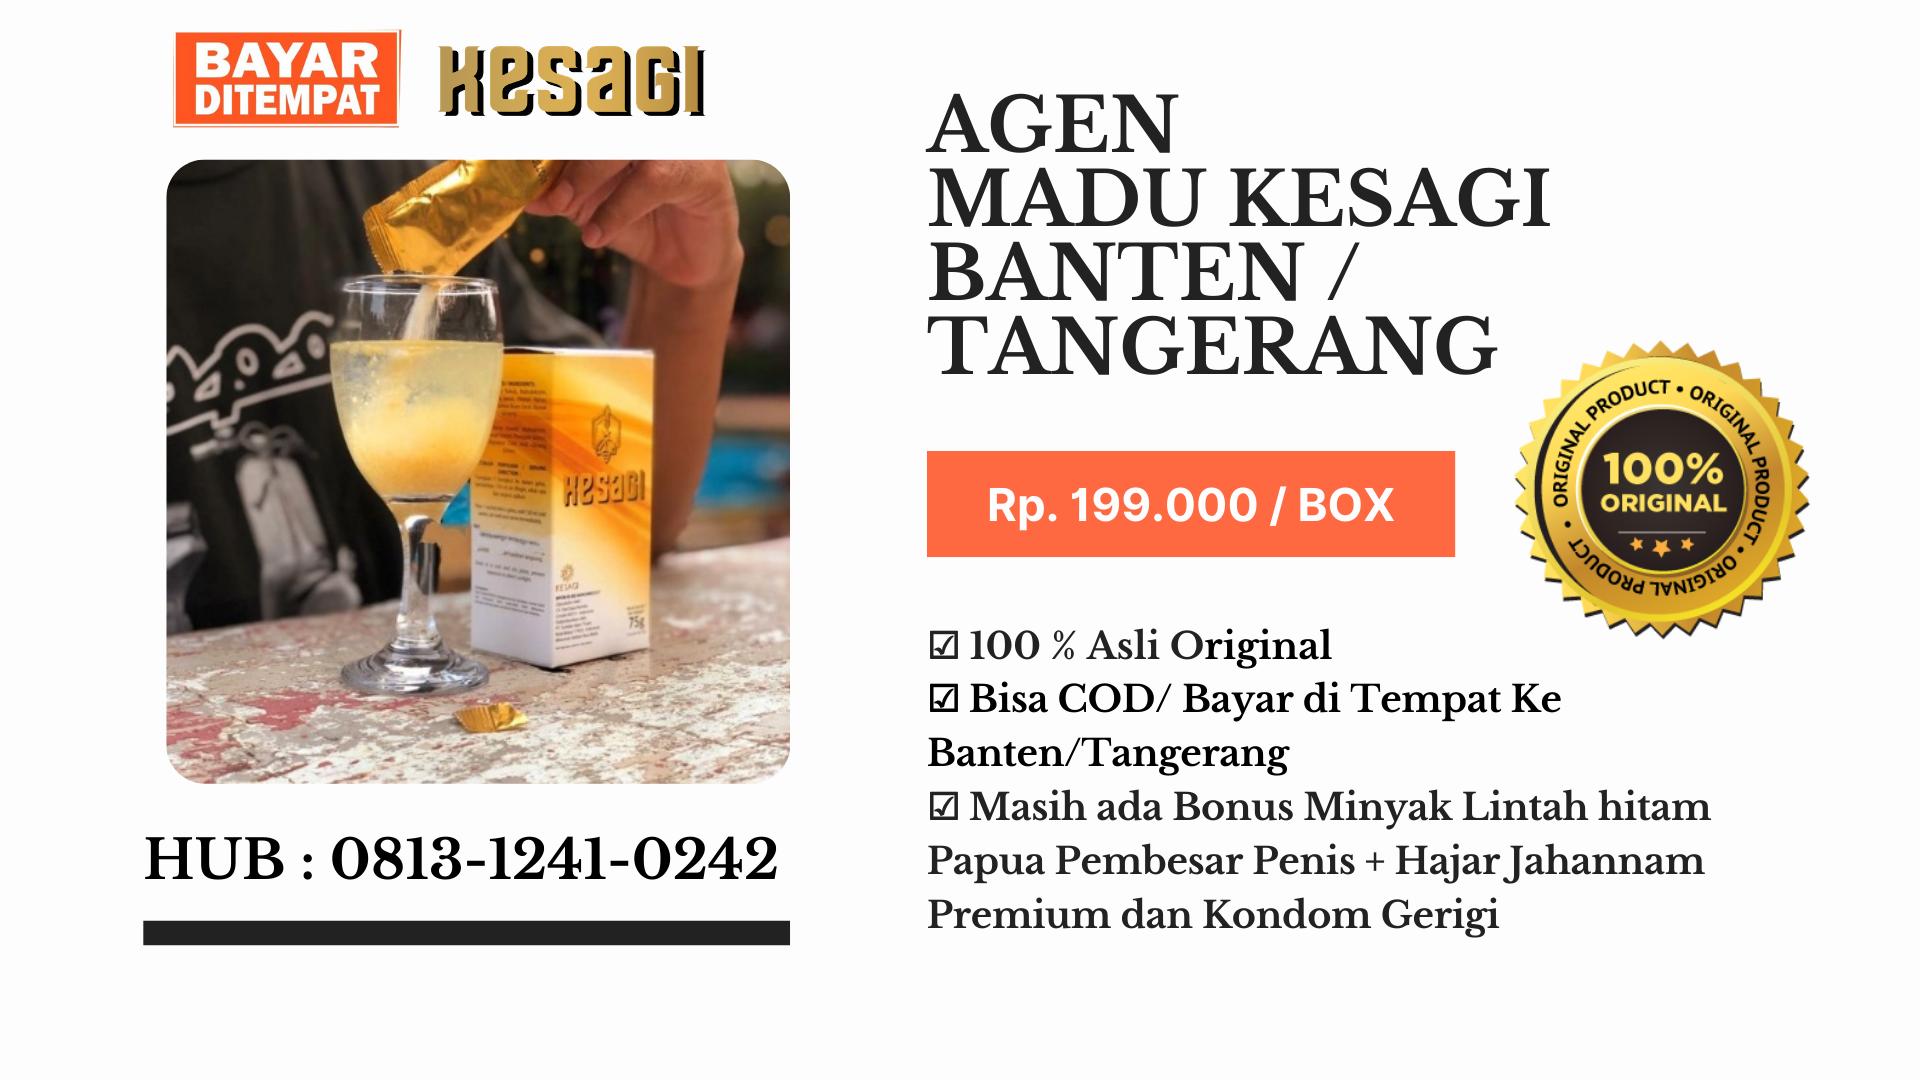 Agen Kesagi Tangerang/Banten Hub : 0813-1241-0242-COD